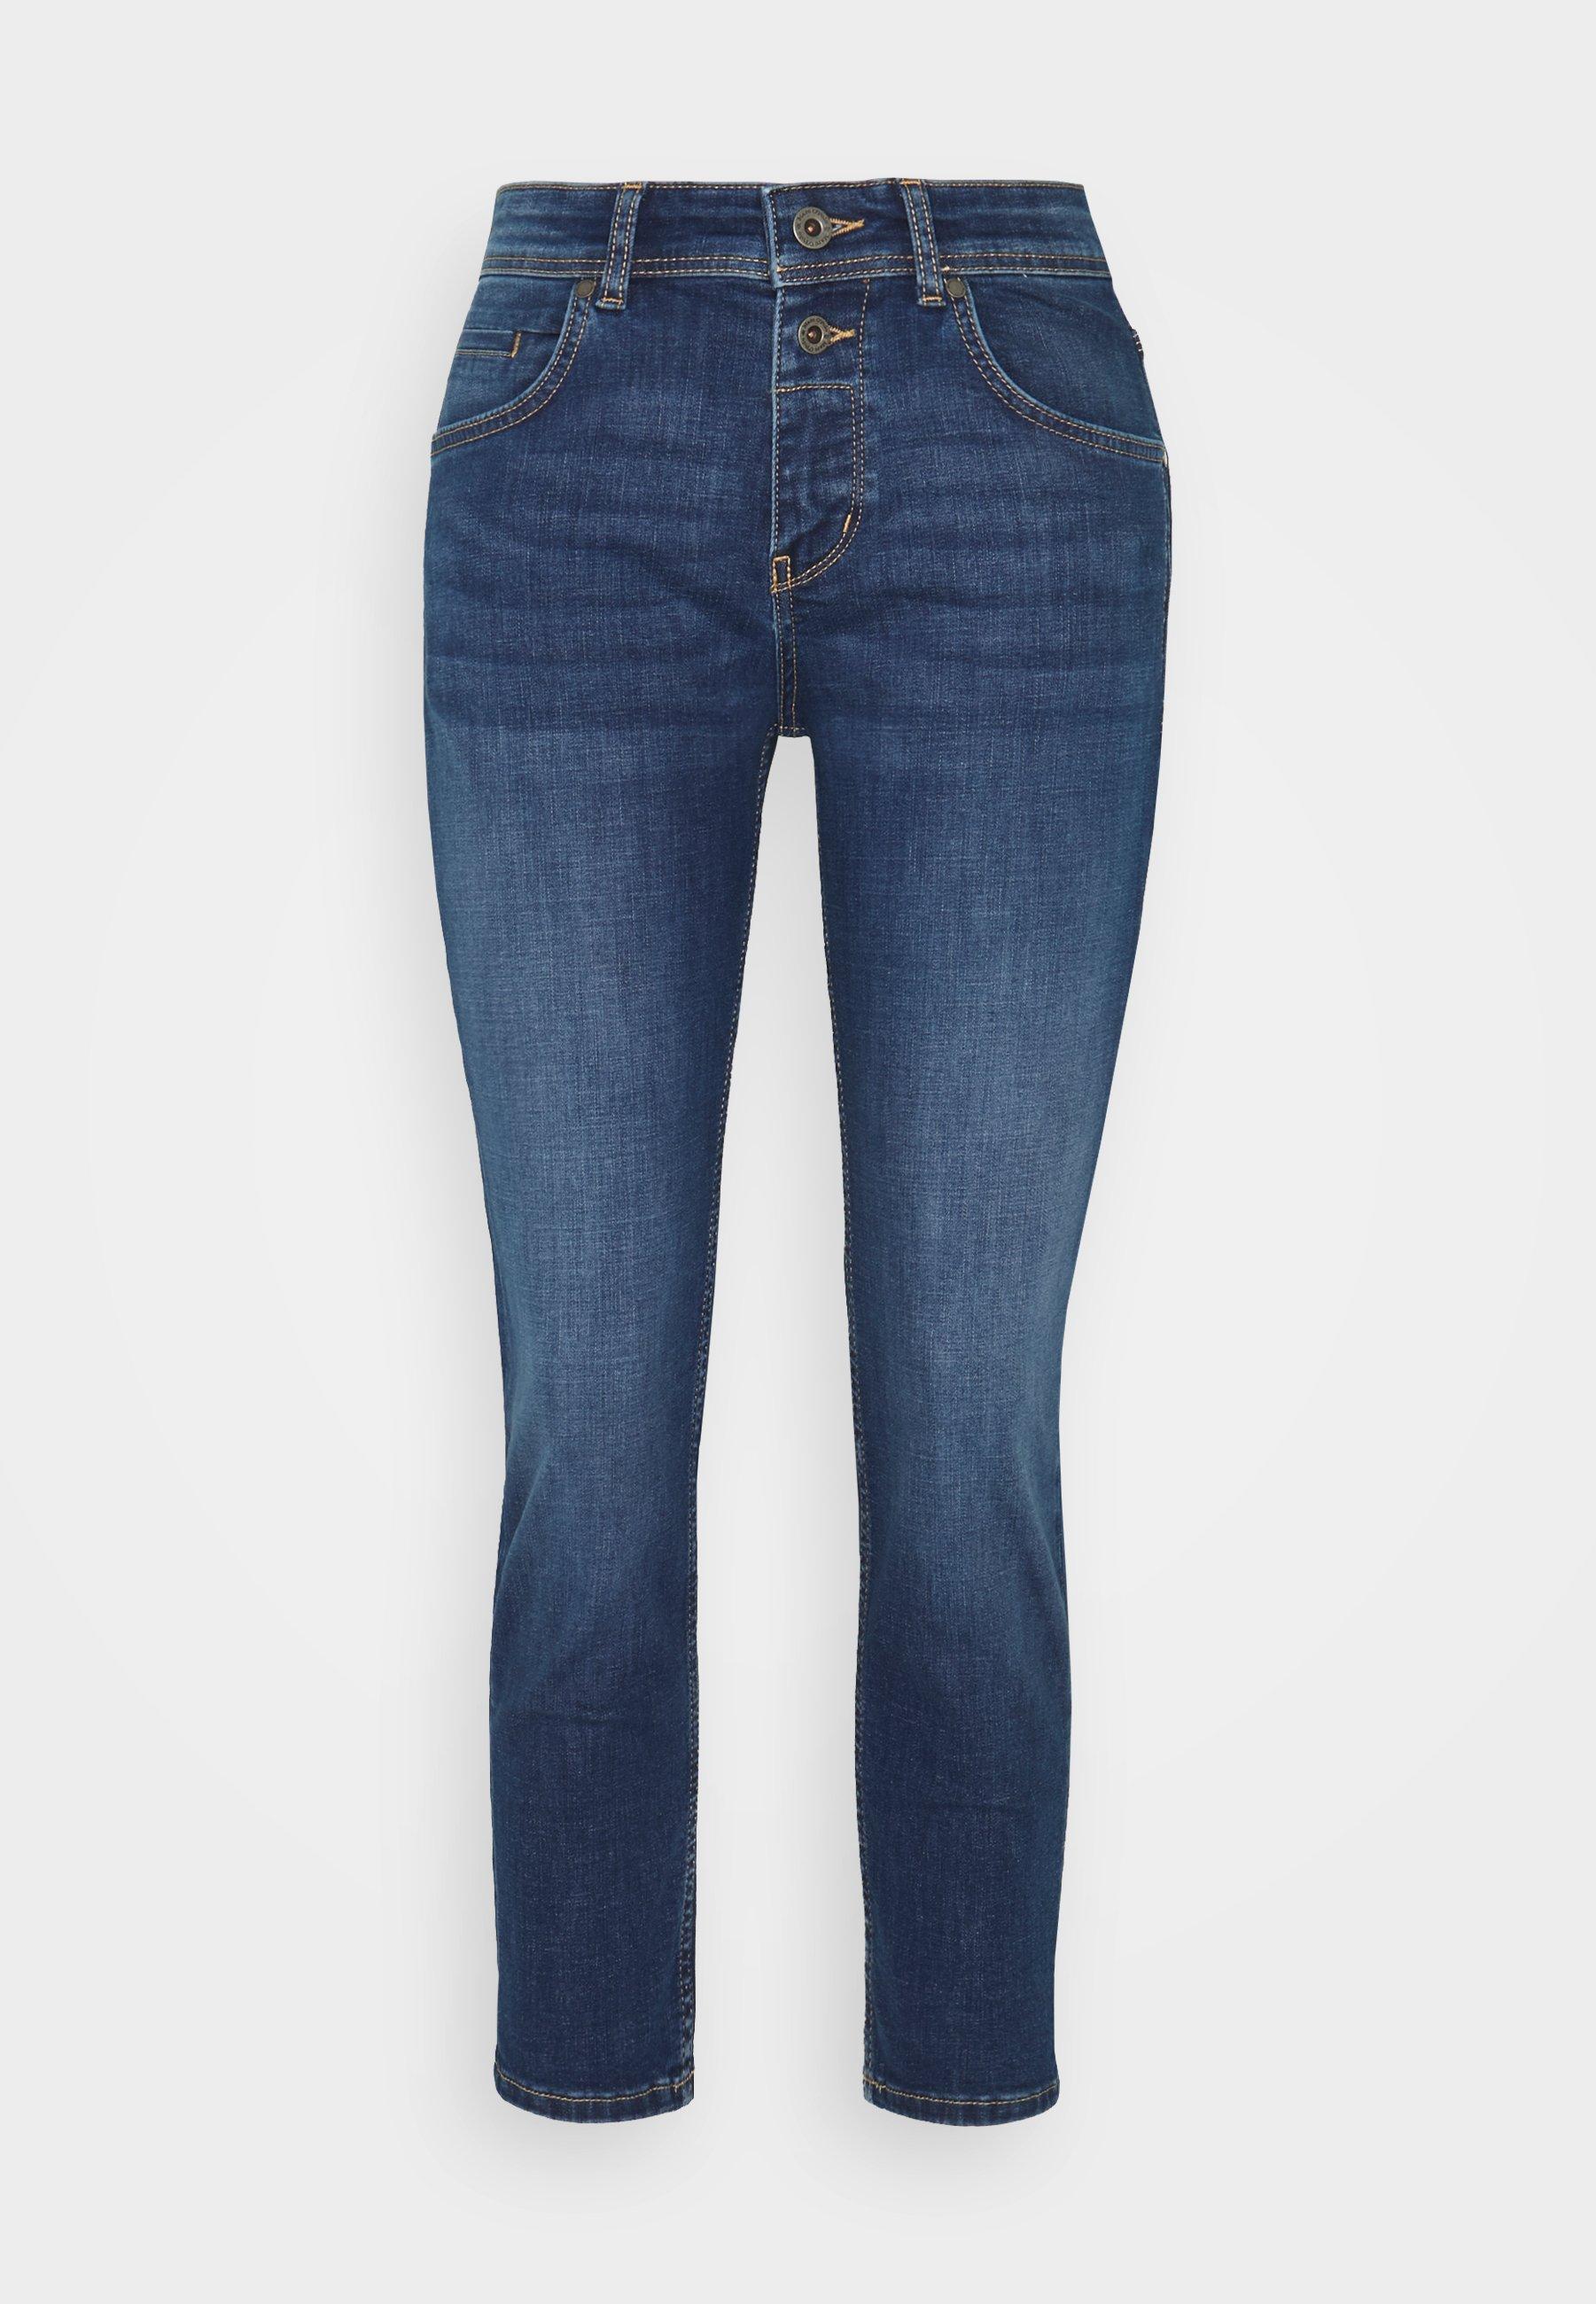 Women DENIM TROUSER MID WAIST BOYFRIEND FIT CROPPED LENGTH - Slim fit jeans